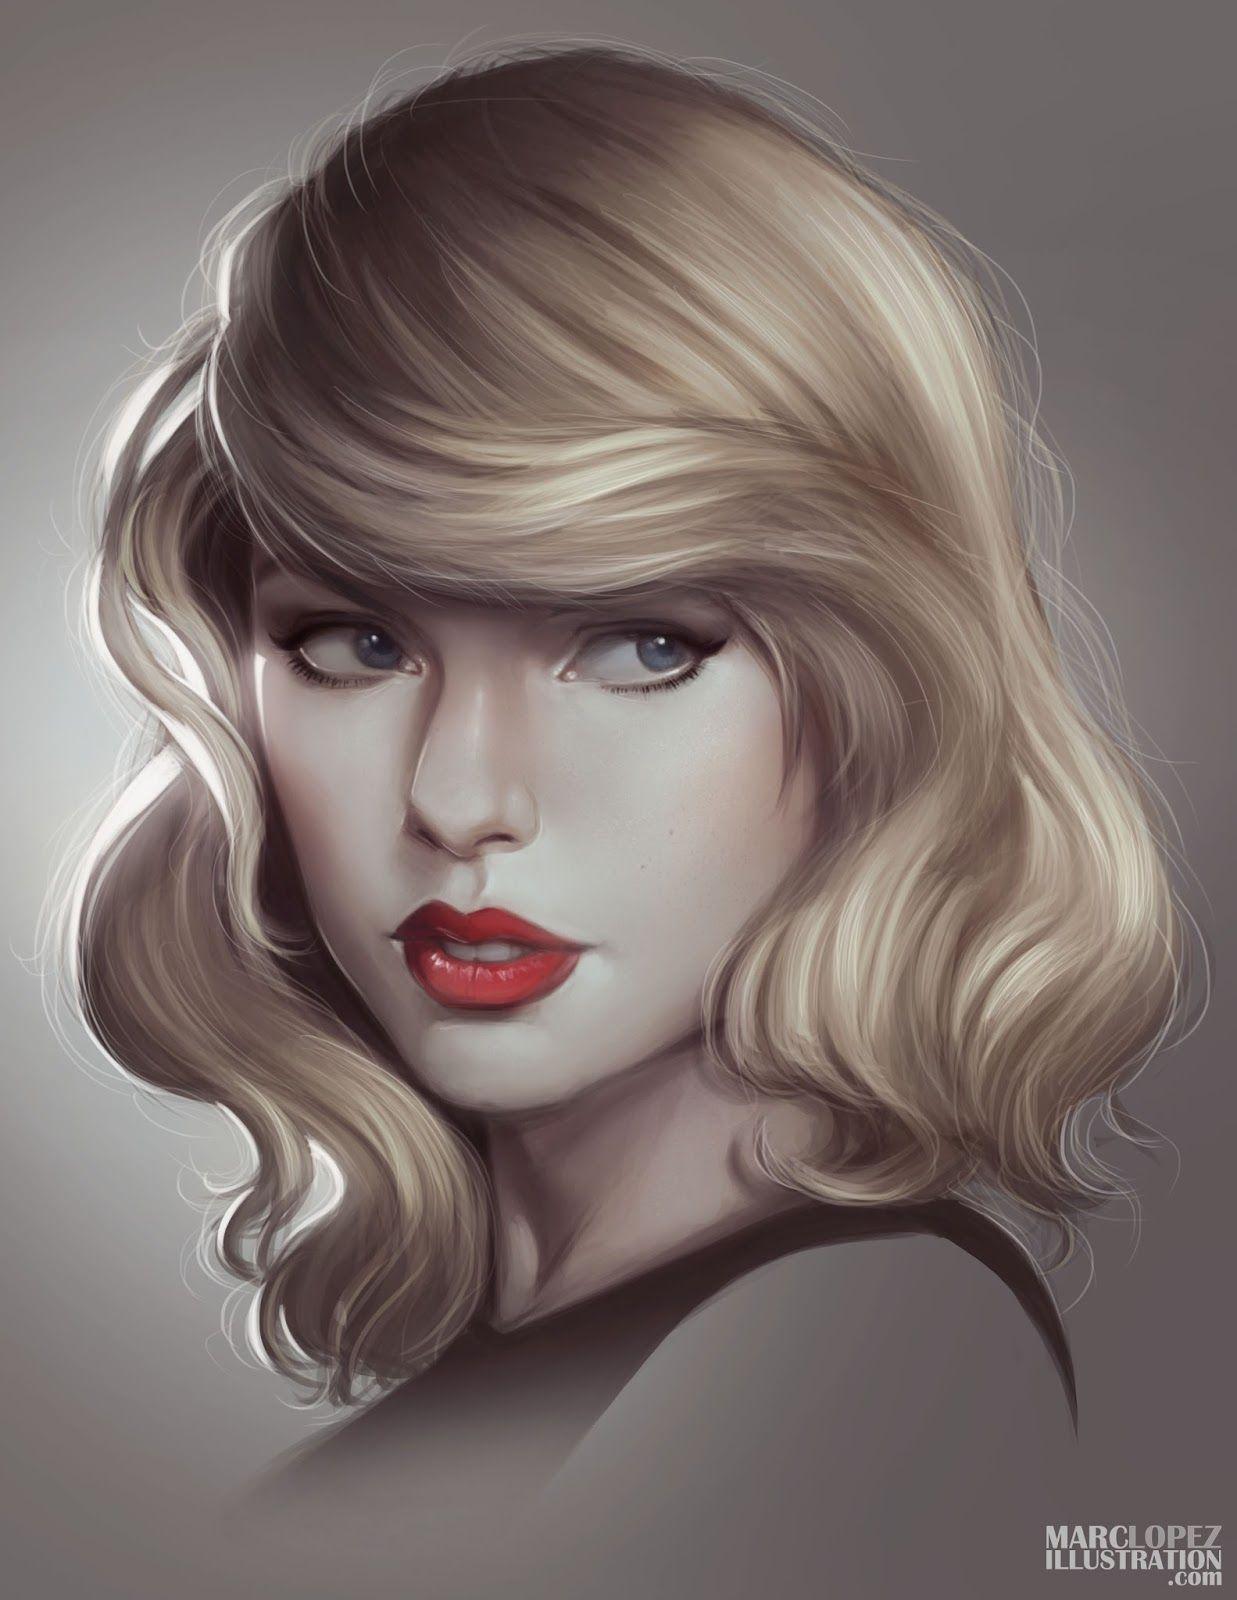 Taylor Swift | Taylor Swift | Pinterest | Taylor swift, Vazquez y Dibujo